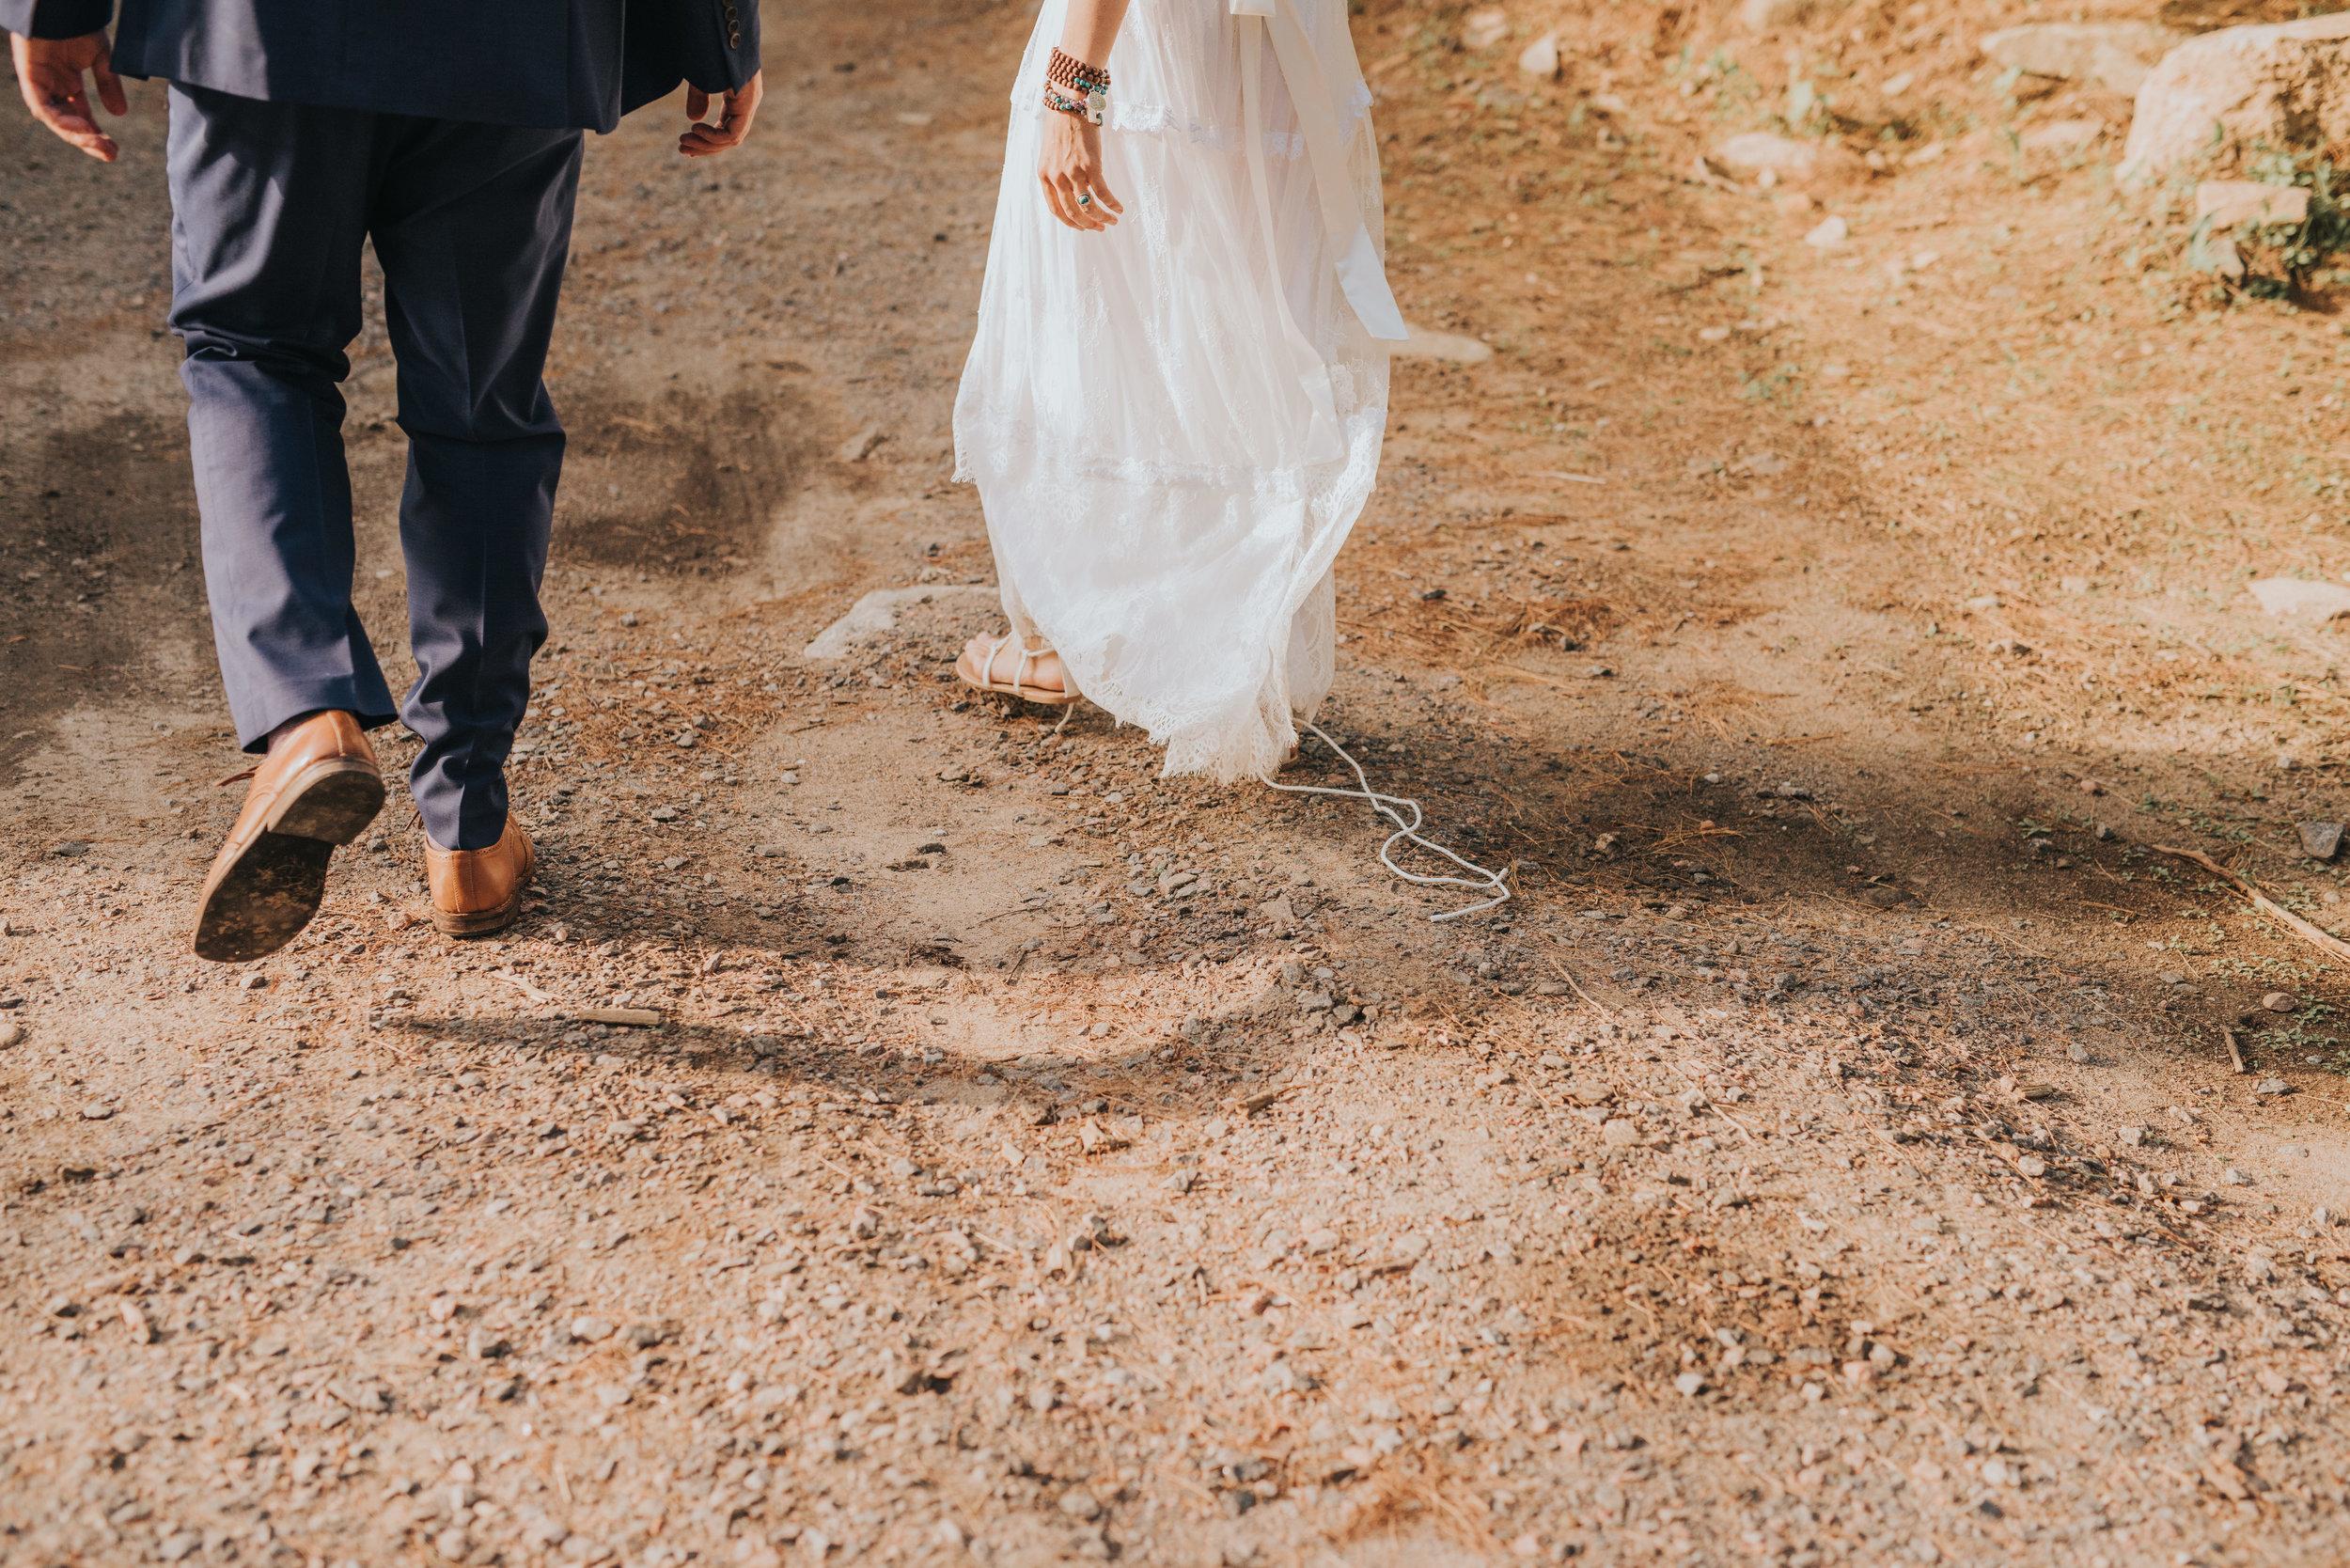 bride-groom-walking-together-rustic-cabin-toronto-bohemian-boho-outdoor-summer-wedding-documentary-wedding-photography-by-willow-birch-photo.jpg